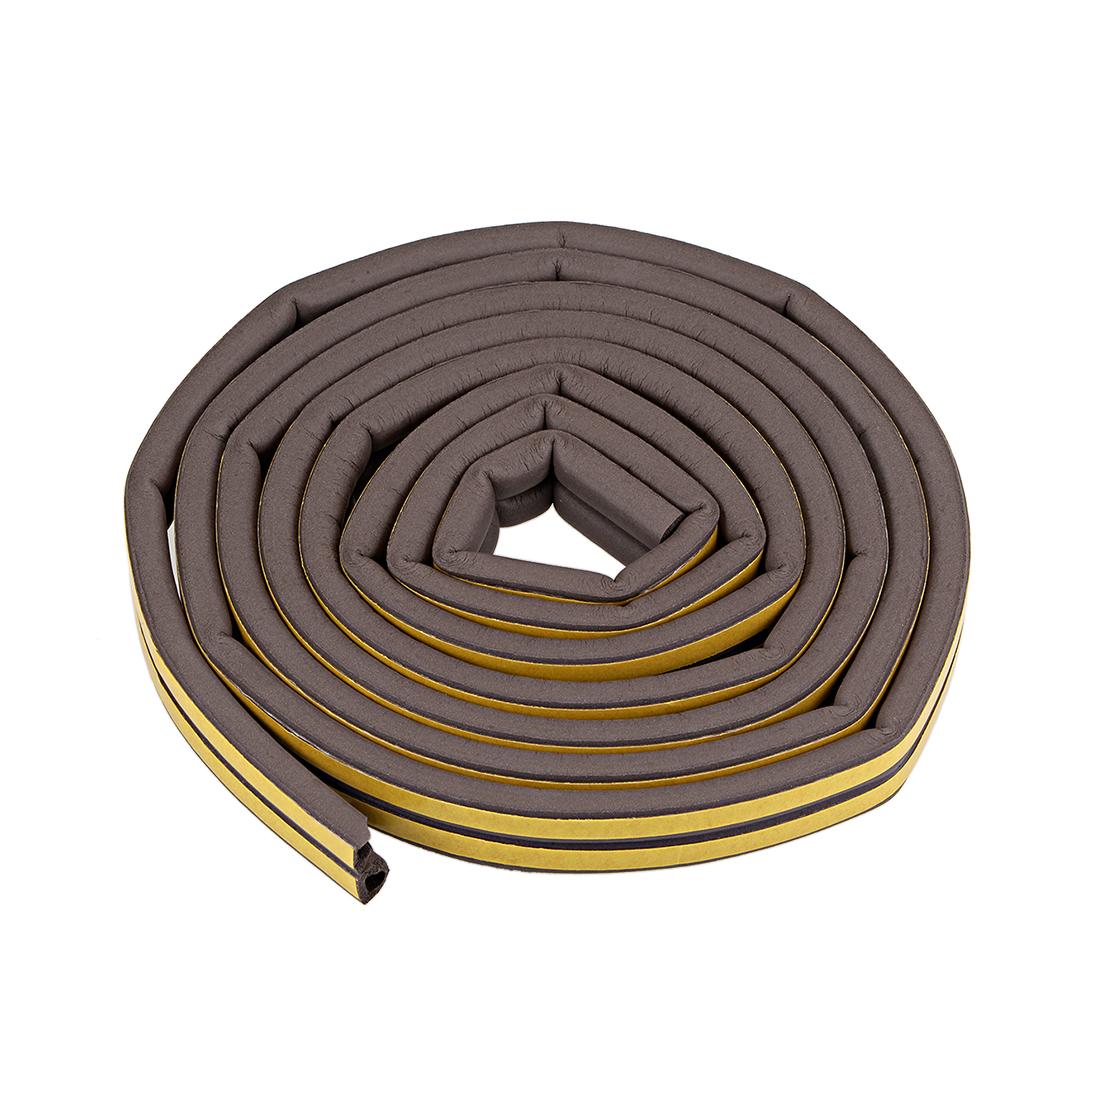 Foam Tape Self-Adhesive Seal Strip 9mm Width 7.5mm Thick 8.2 Feet Brown 2Pcs